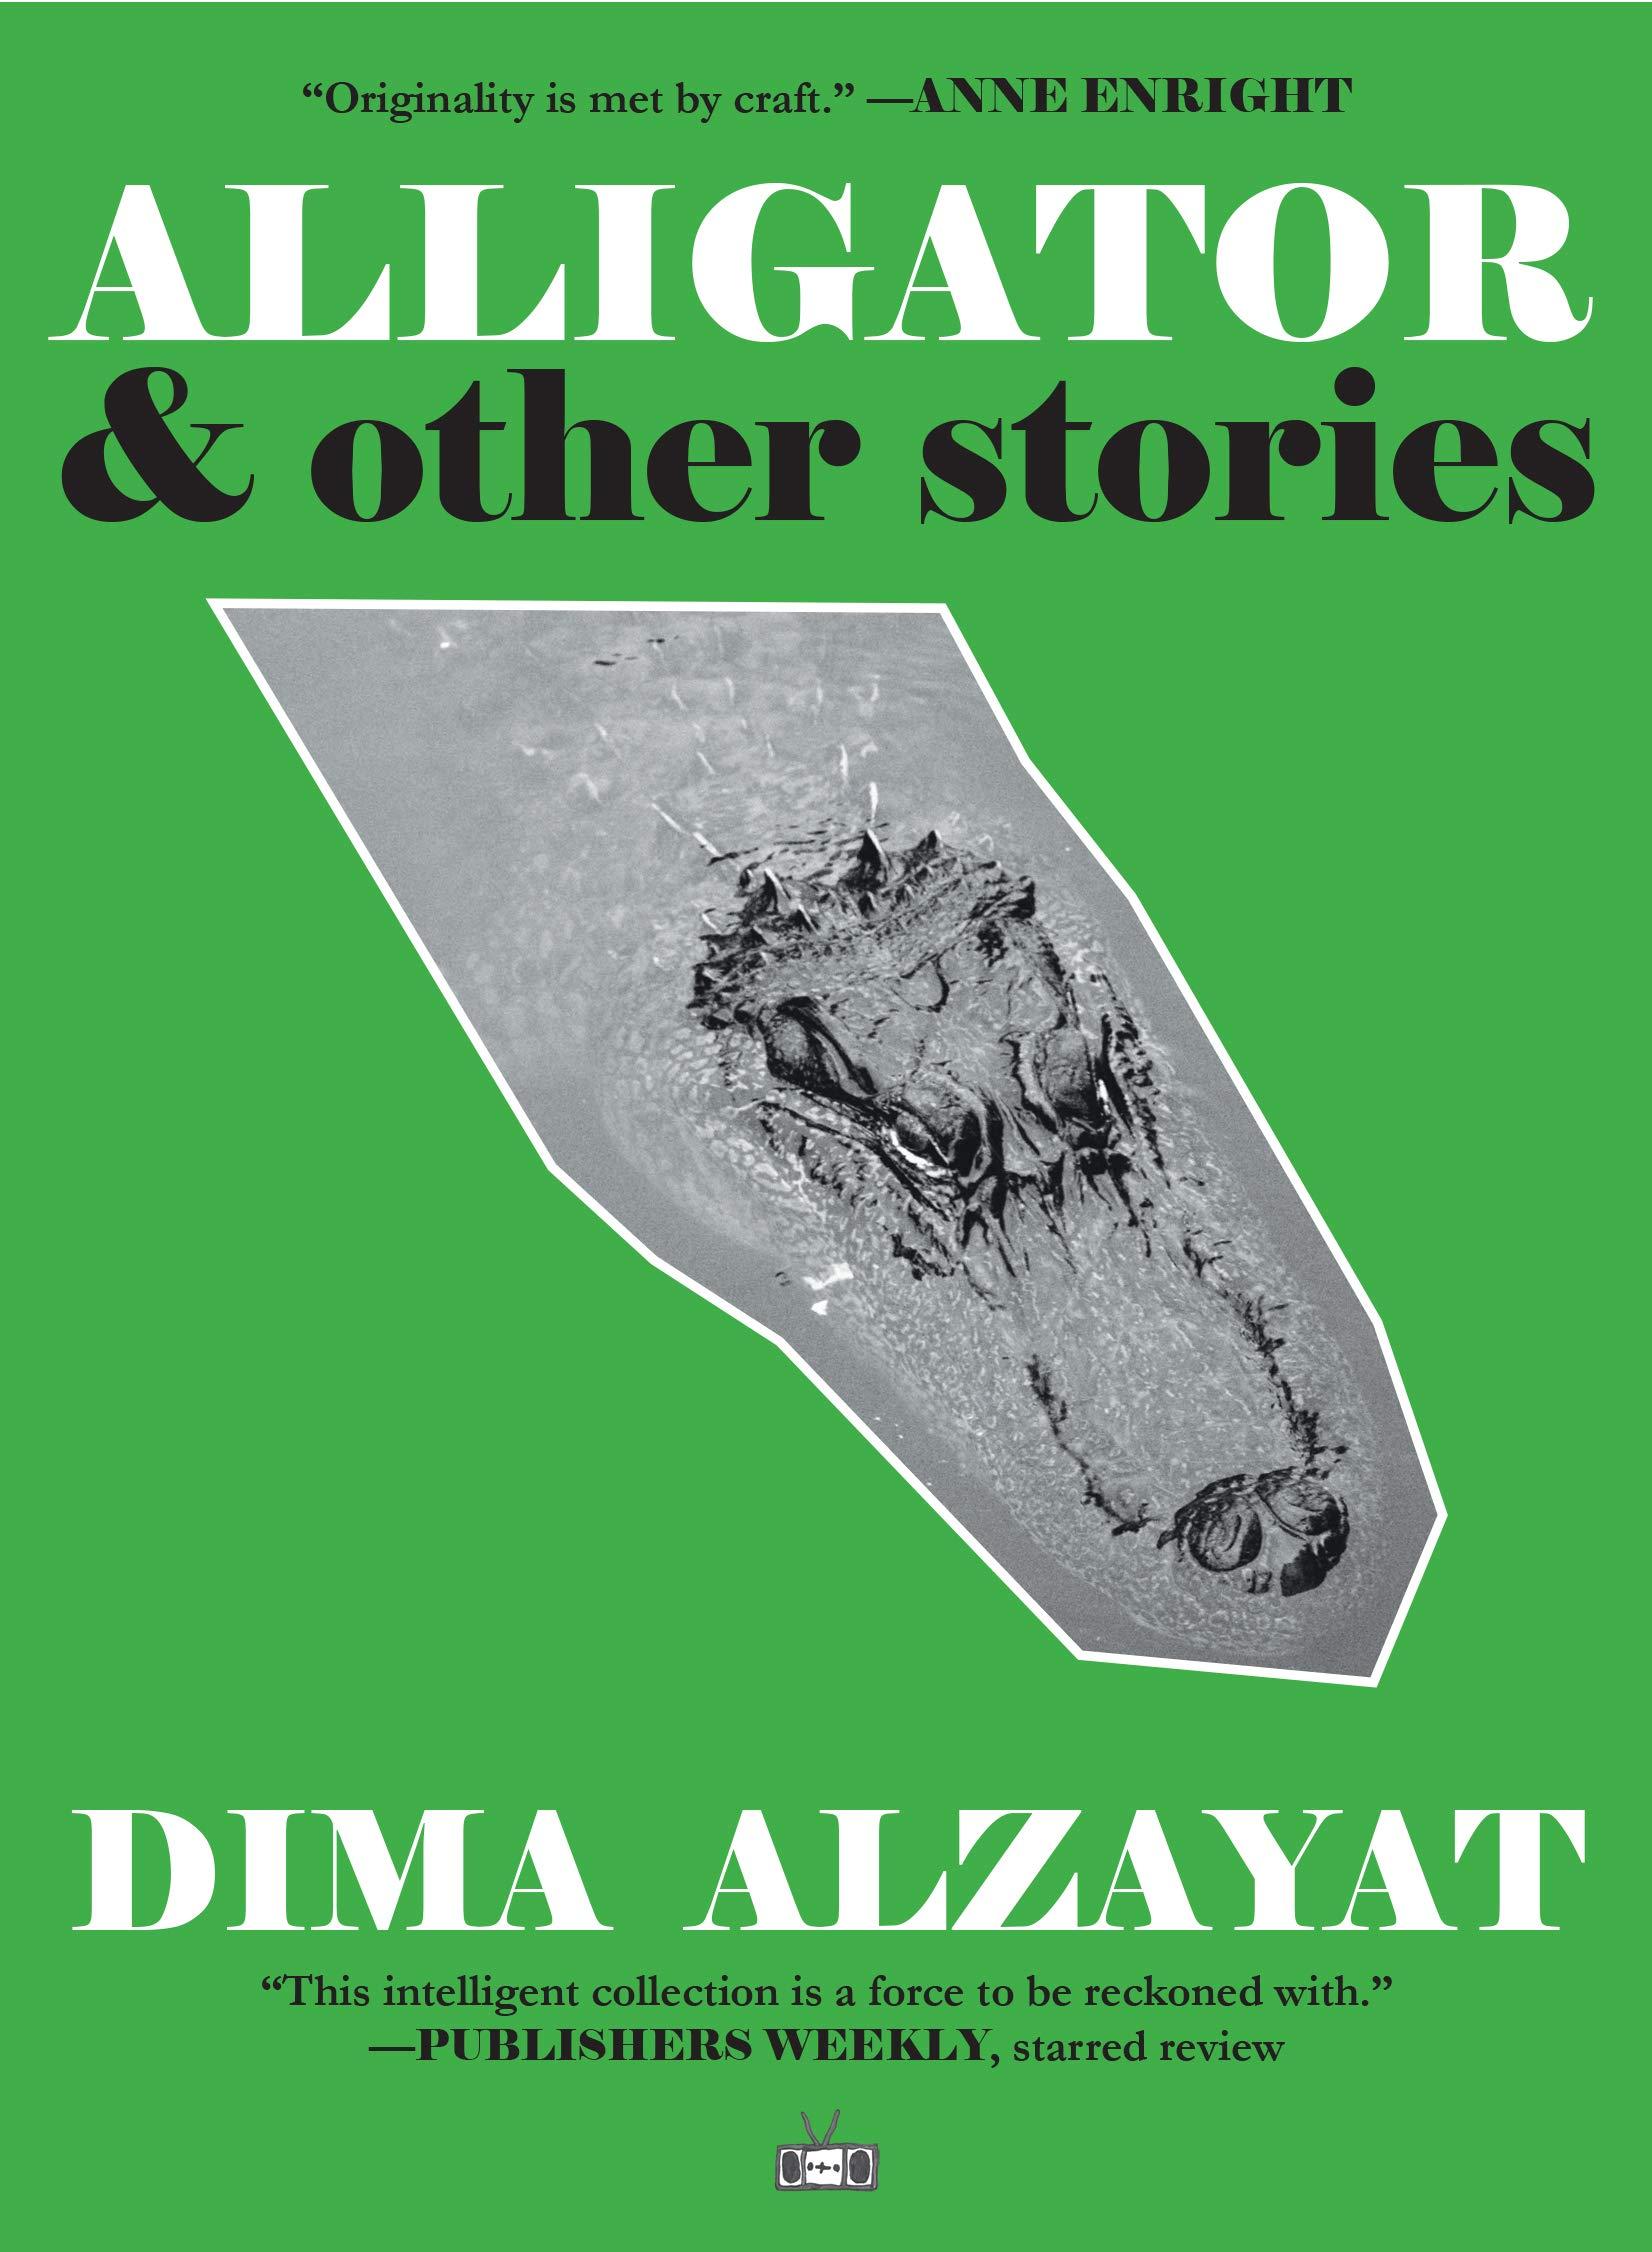 Amazon.com: Alligator (9781937512897): Alzayat, Dima: Books